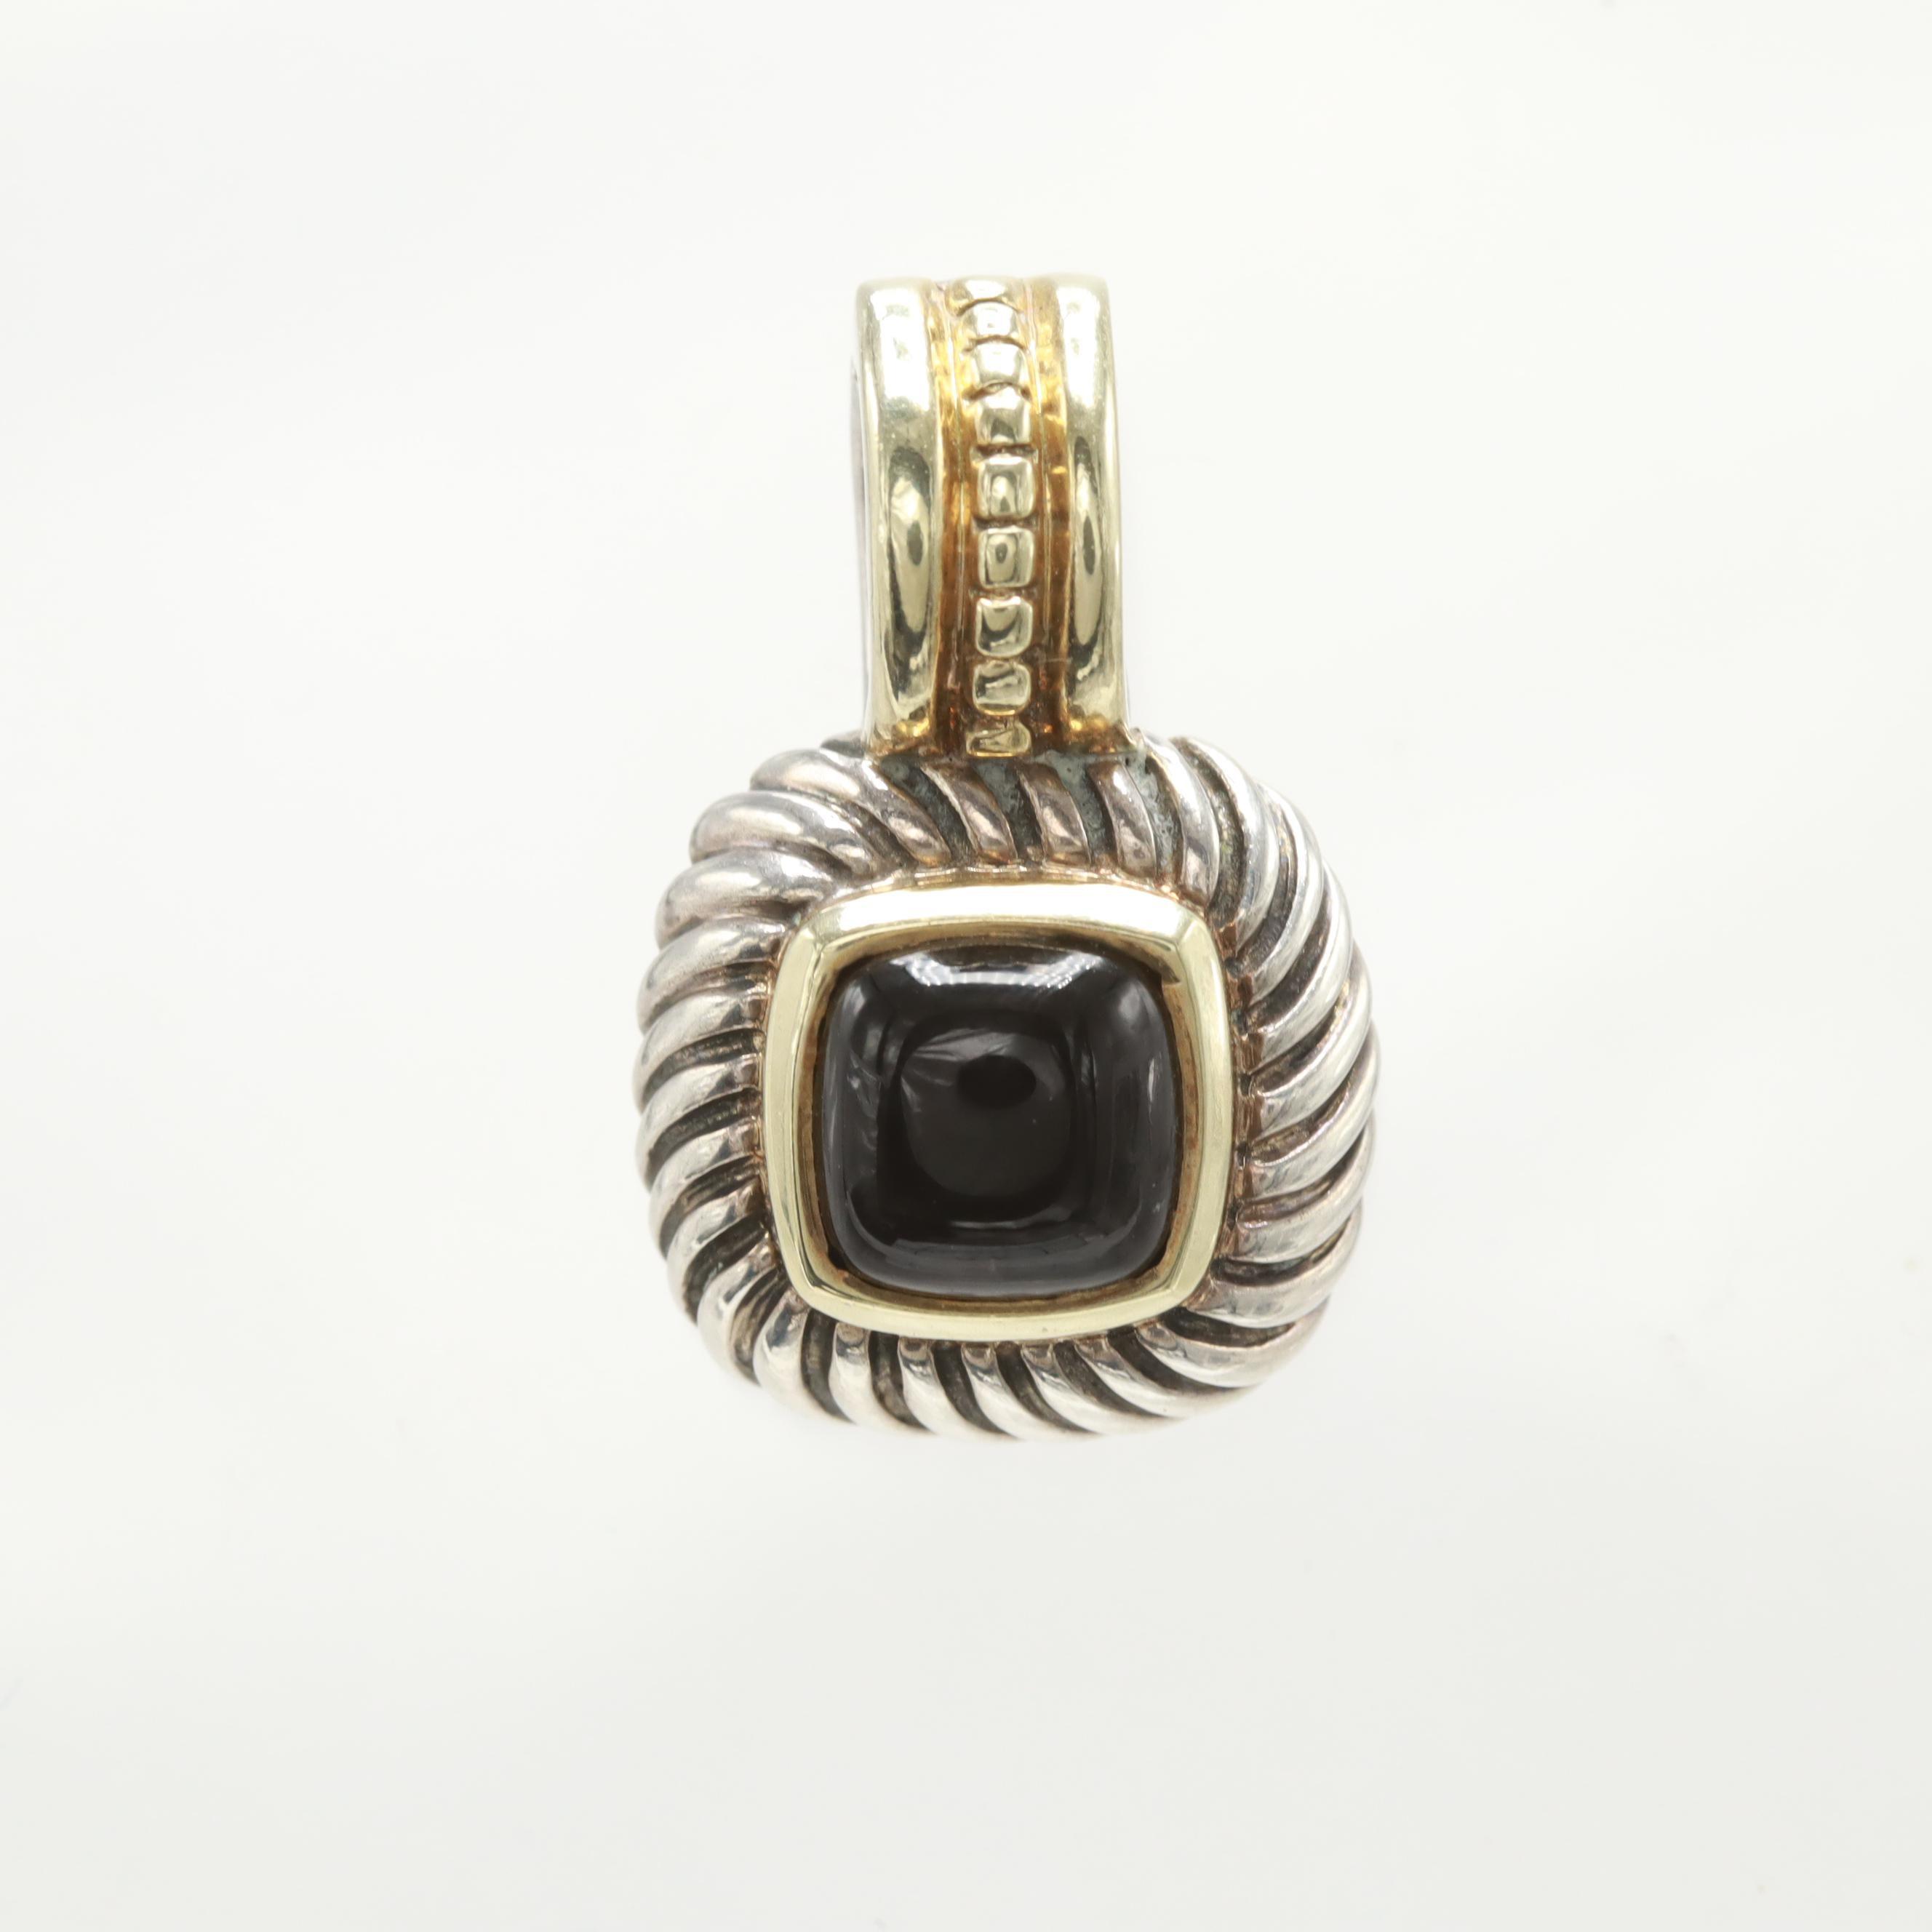 David Yurman Sterling Silver and 14K Yellow Gold Black Onyx Pendant